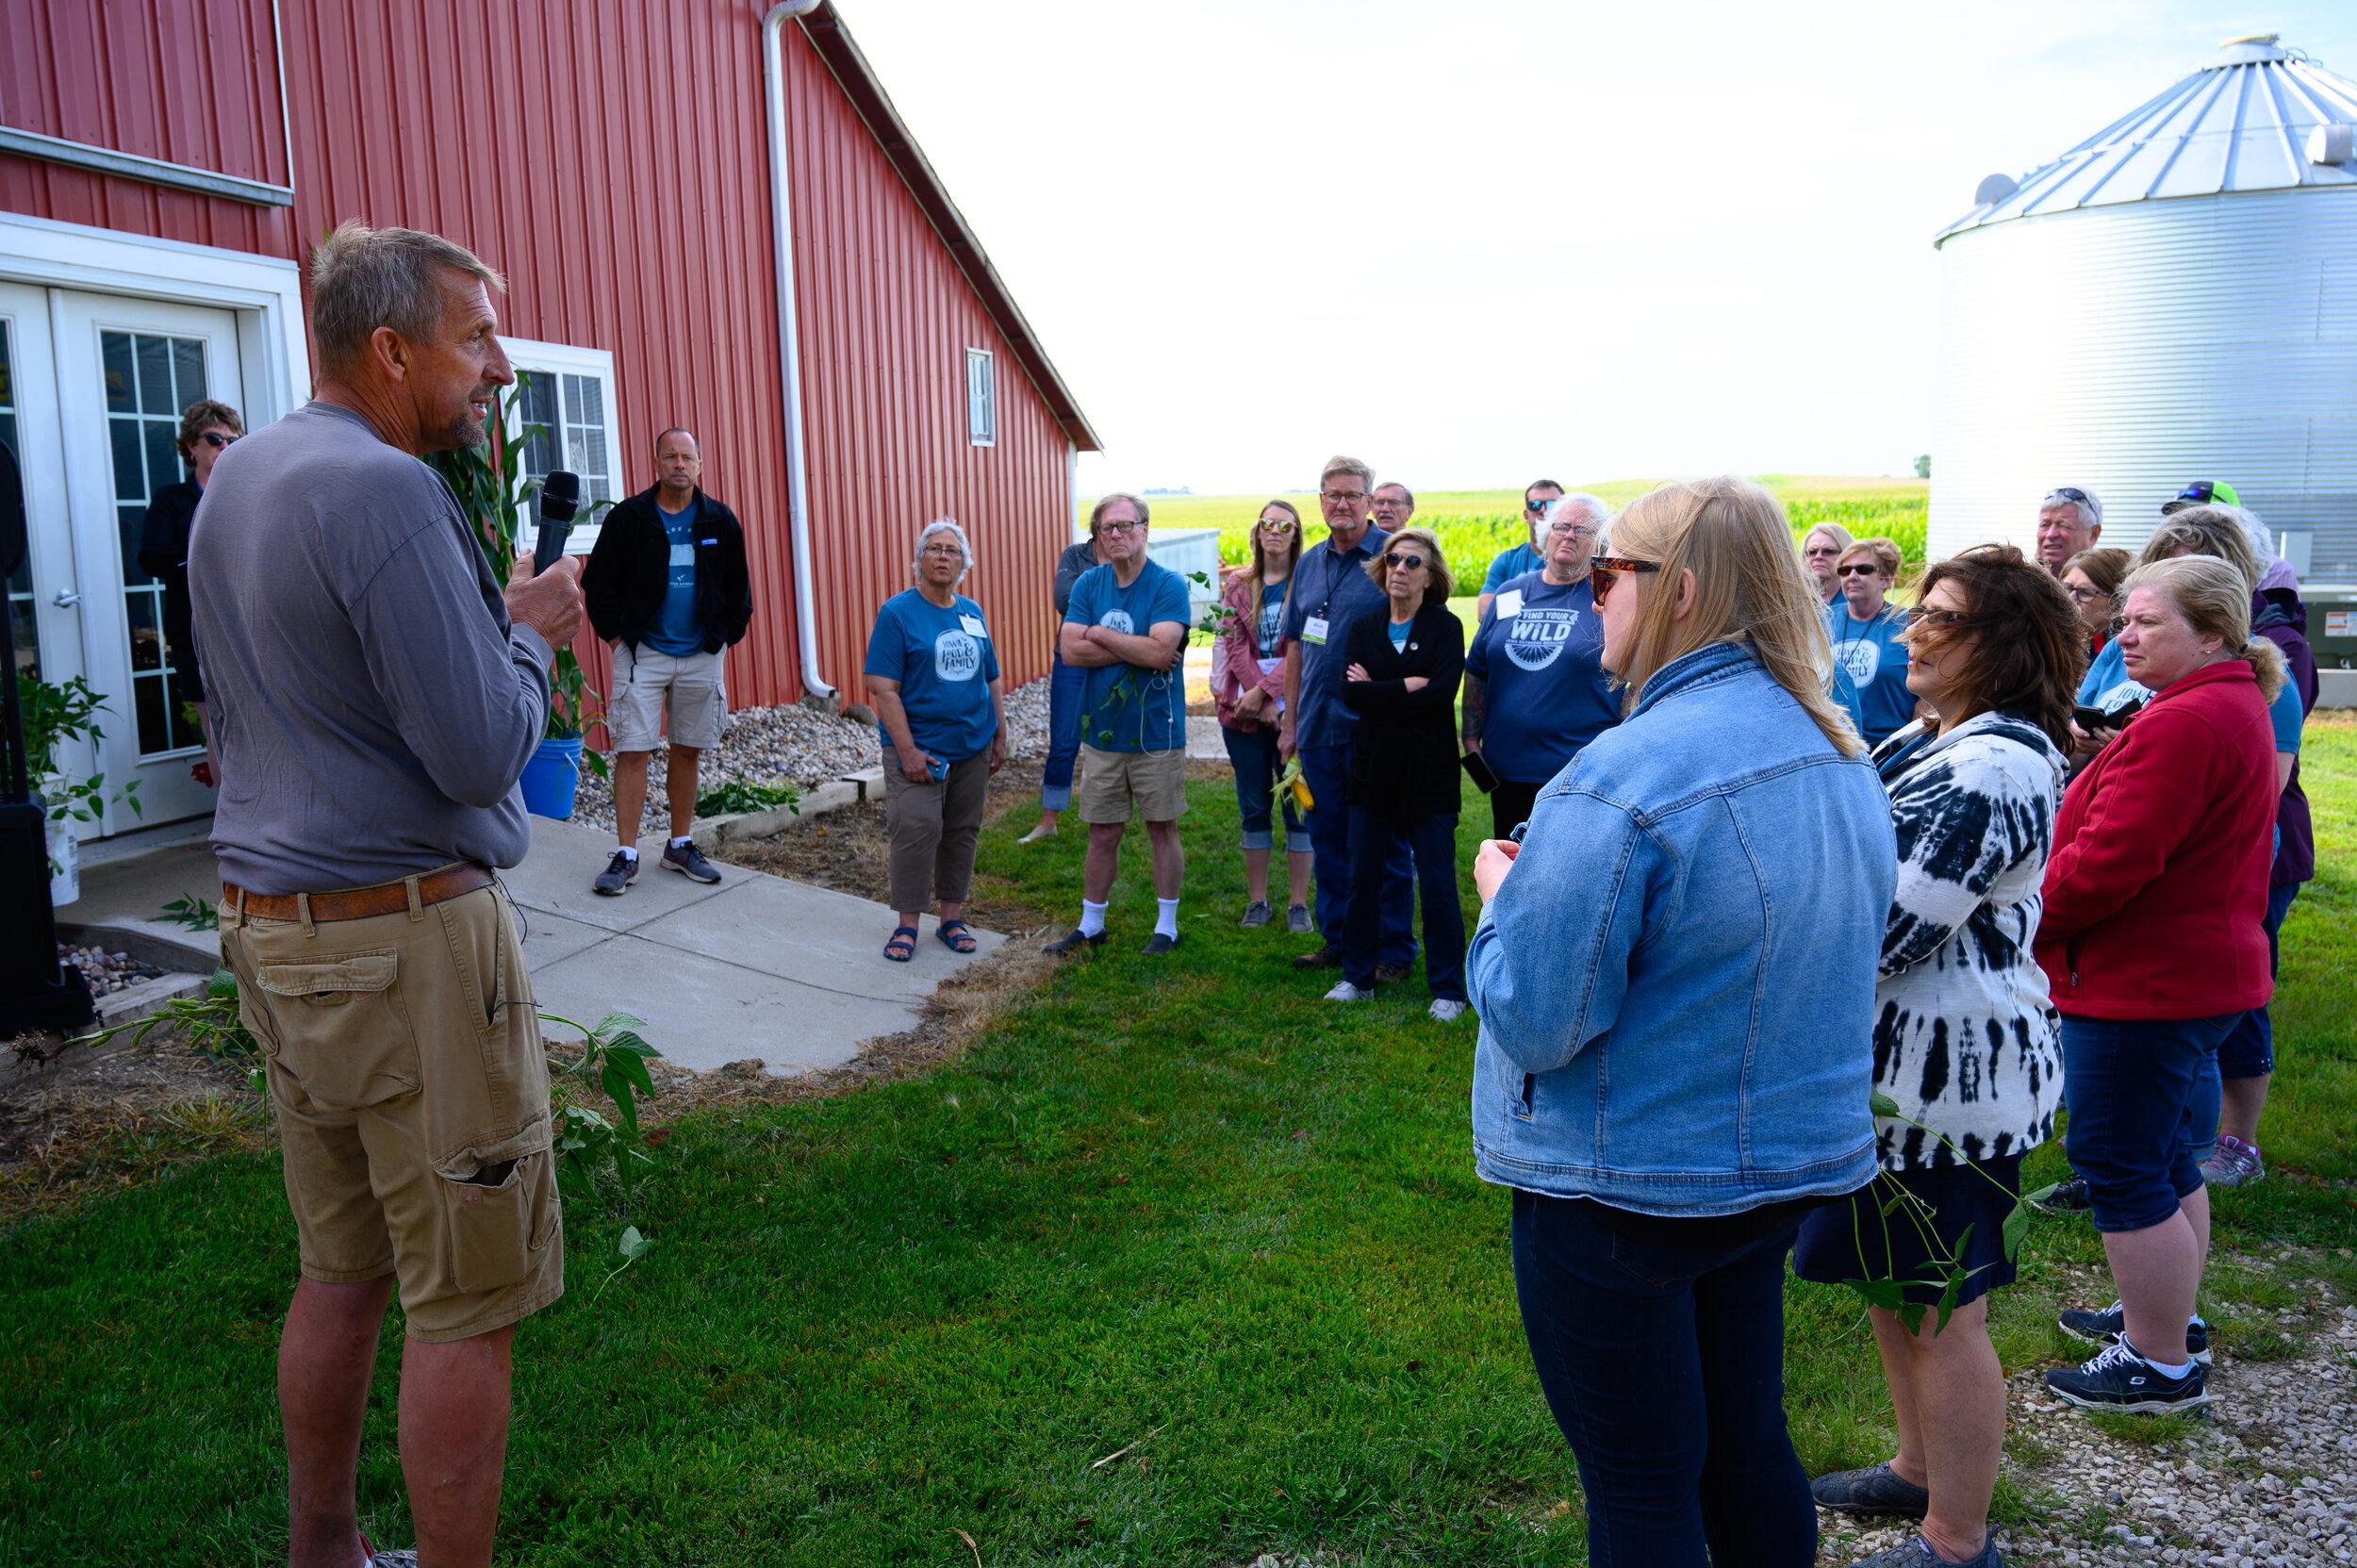 Jeff Frank welcomes participants to his Century Farm near Auburn. Photo credit: Joseph L. Murphy/Iowa Soybean Association